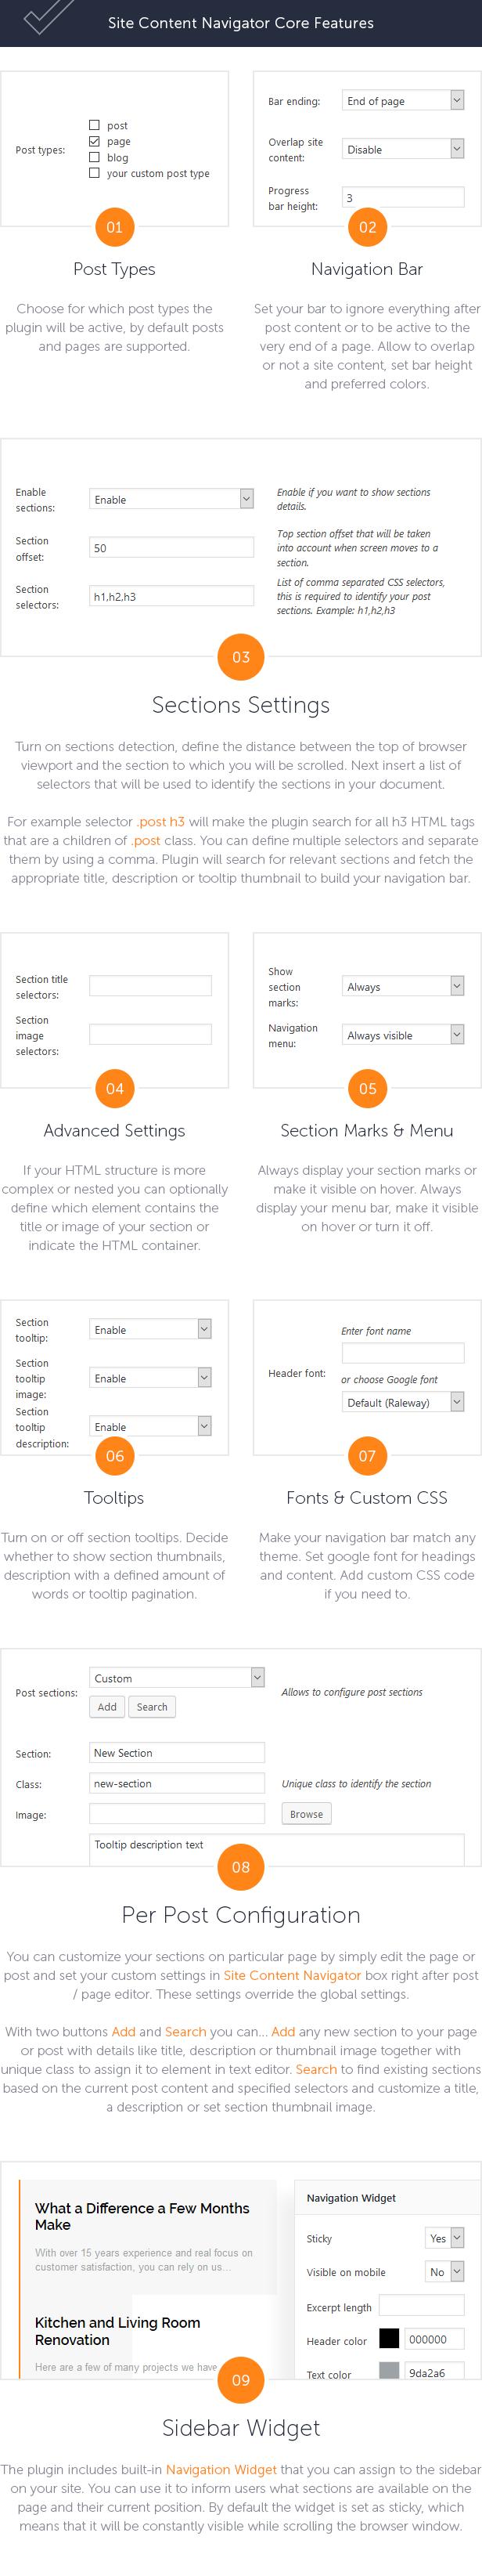 Site Content Navigator For WordPress - 2